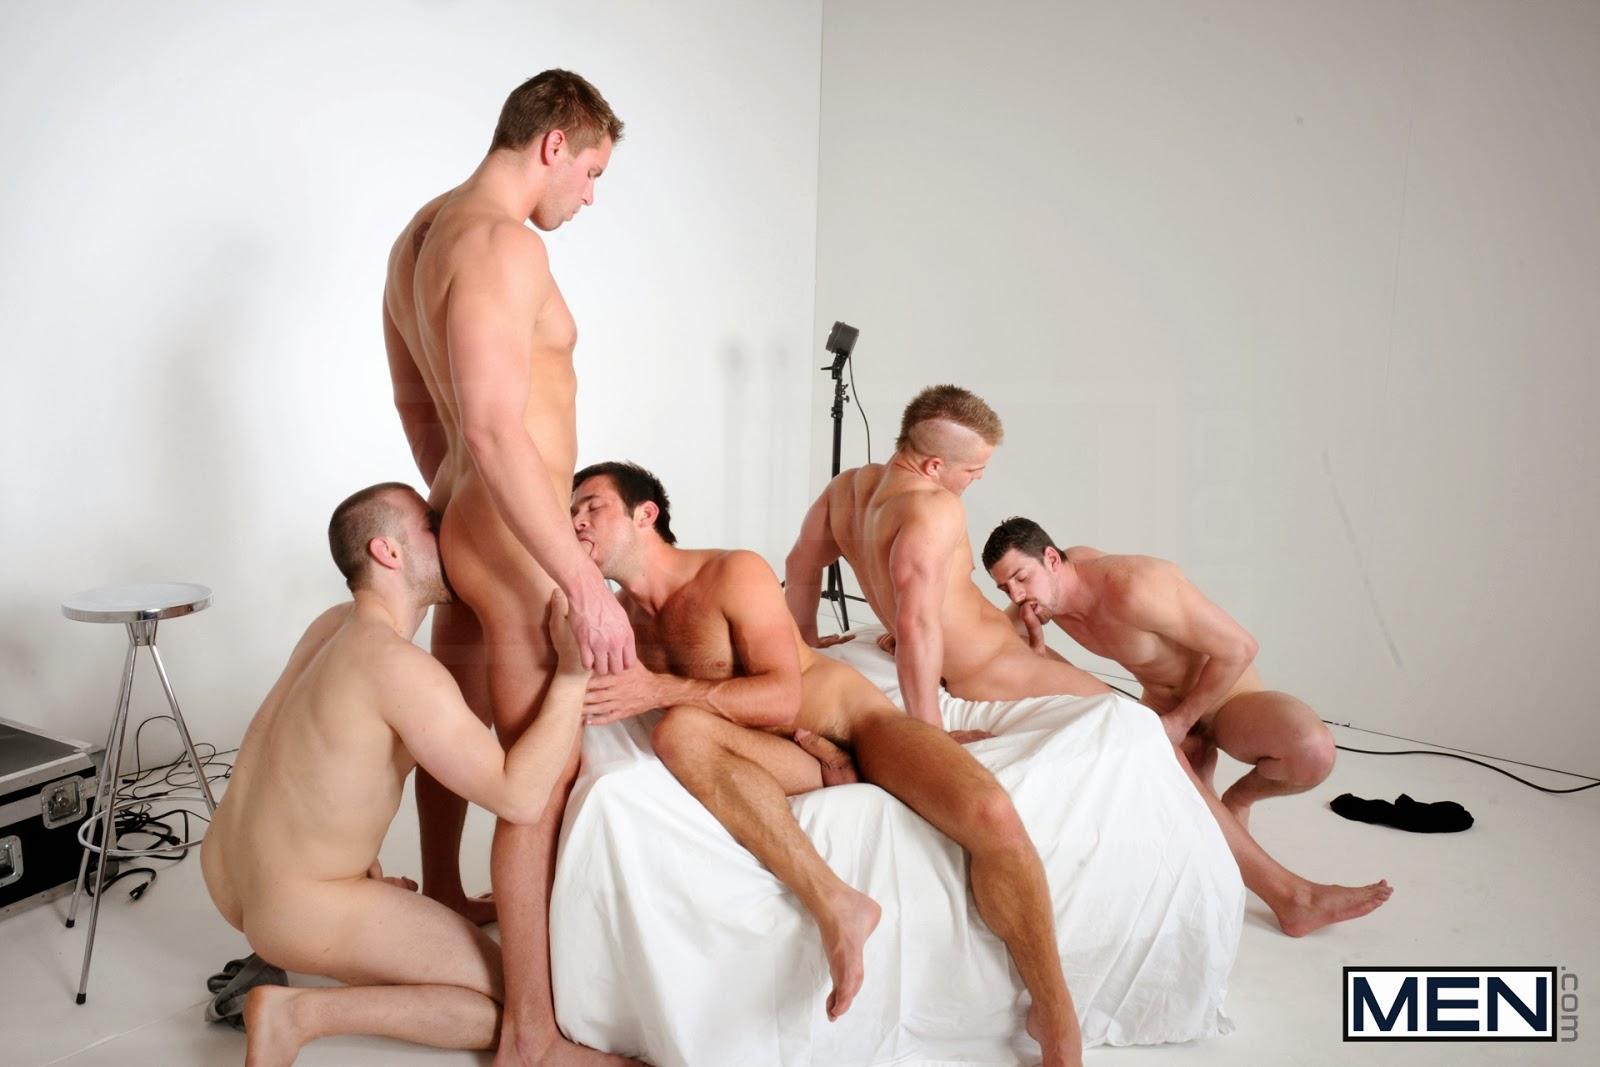 horny busty pornstar doing dildo sex toy masturbate xxx hd images